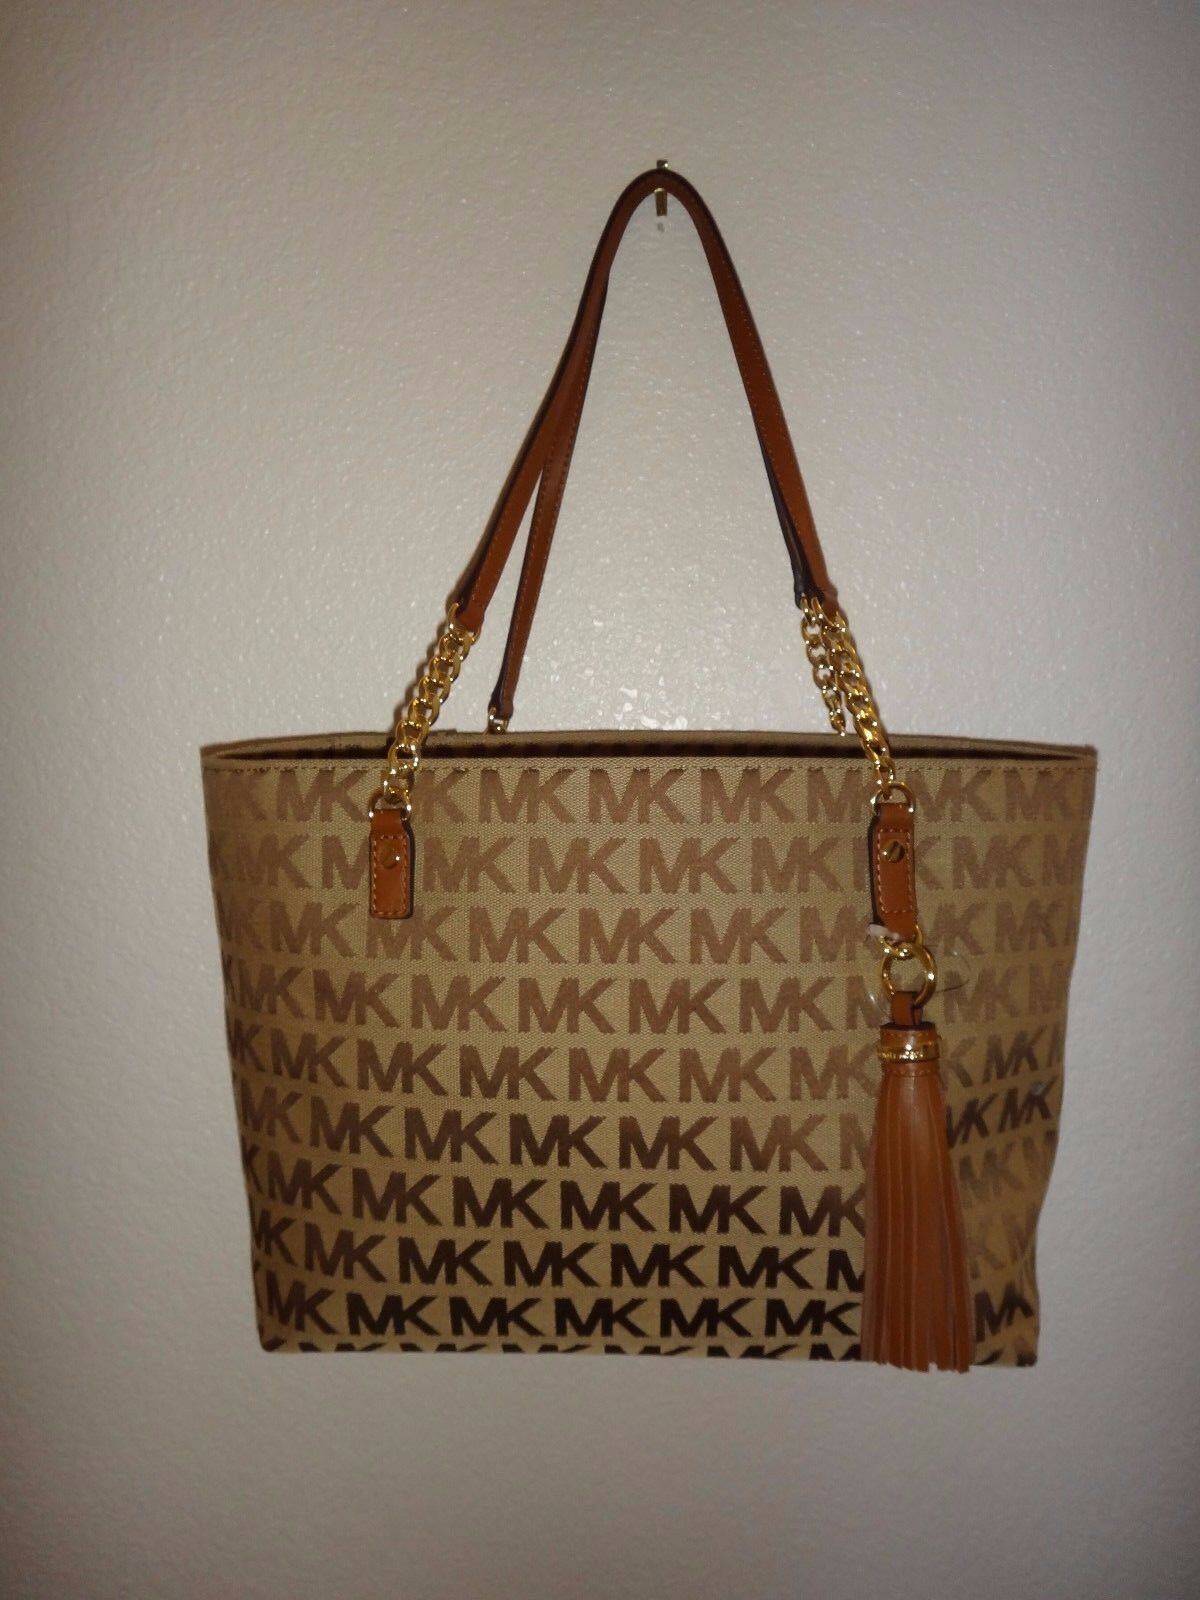 845d3a08916a Michael Kors Jet Set EW Tassel Chain Tote Bag MK Signature Jacquard ...